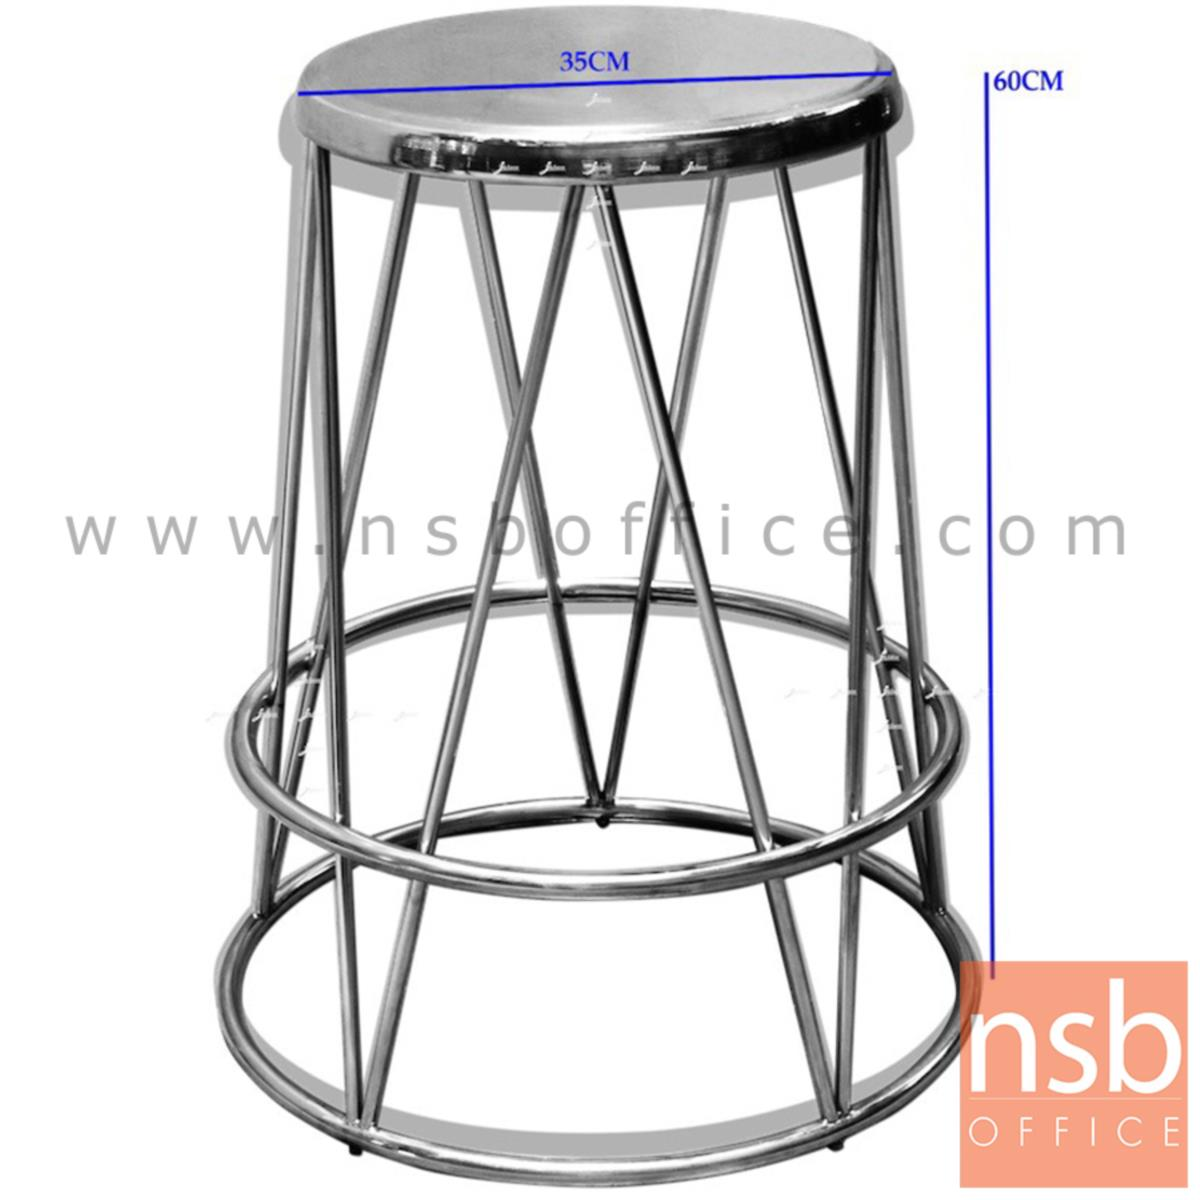 G12A262:เก้าอี้สเตนเลส รุ่น DRAGONFLY (ดรากอนฟลาย) ขนาด 35Di*60H cm.